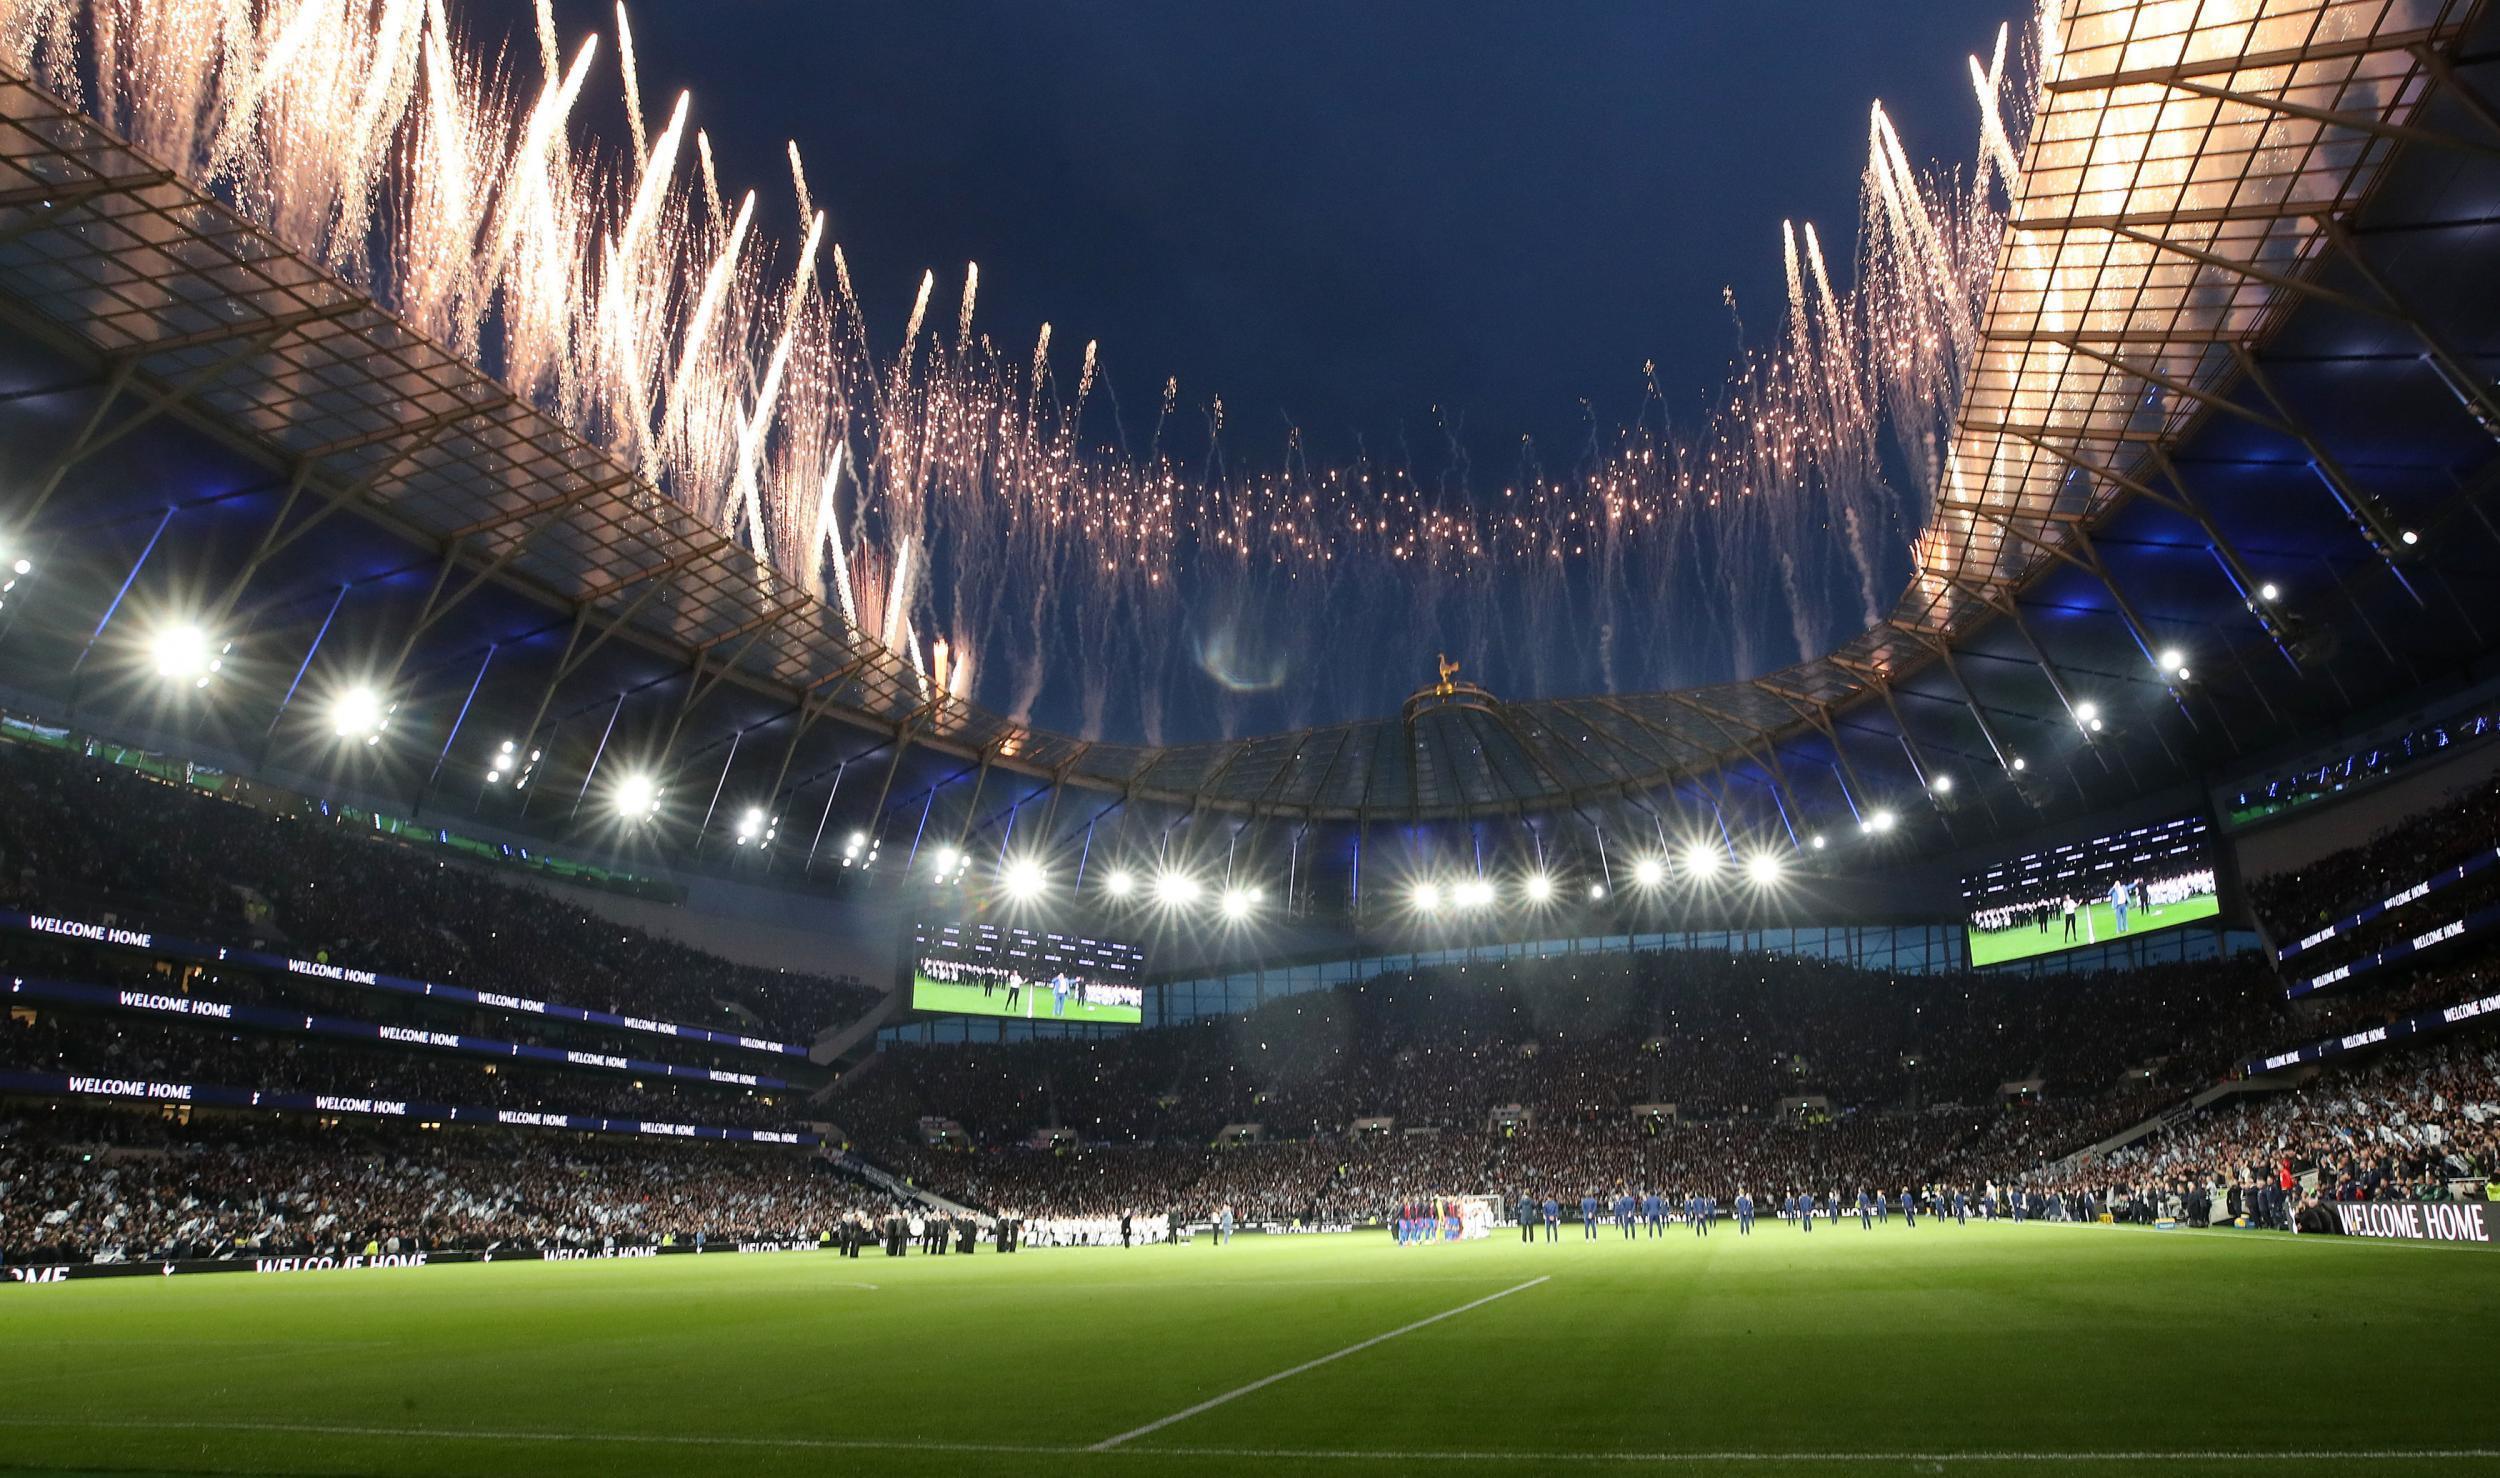 Tottenham Hotspur Stadium Wallpapers Top Free Tottenham Hotspur Stadium Backgrounds Wallpaperaccess